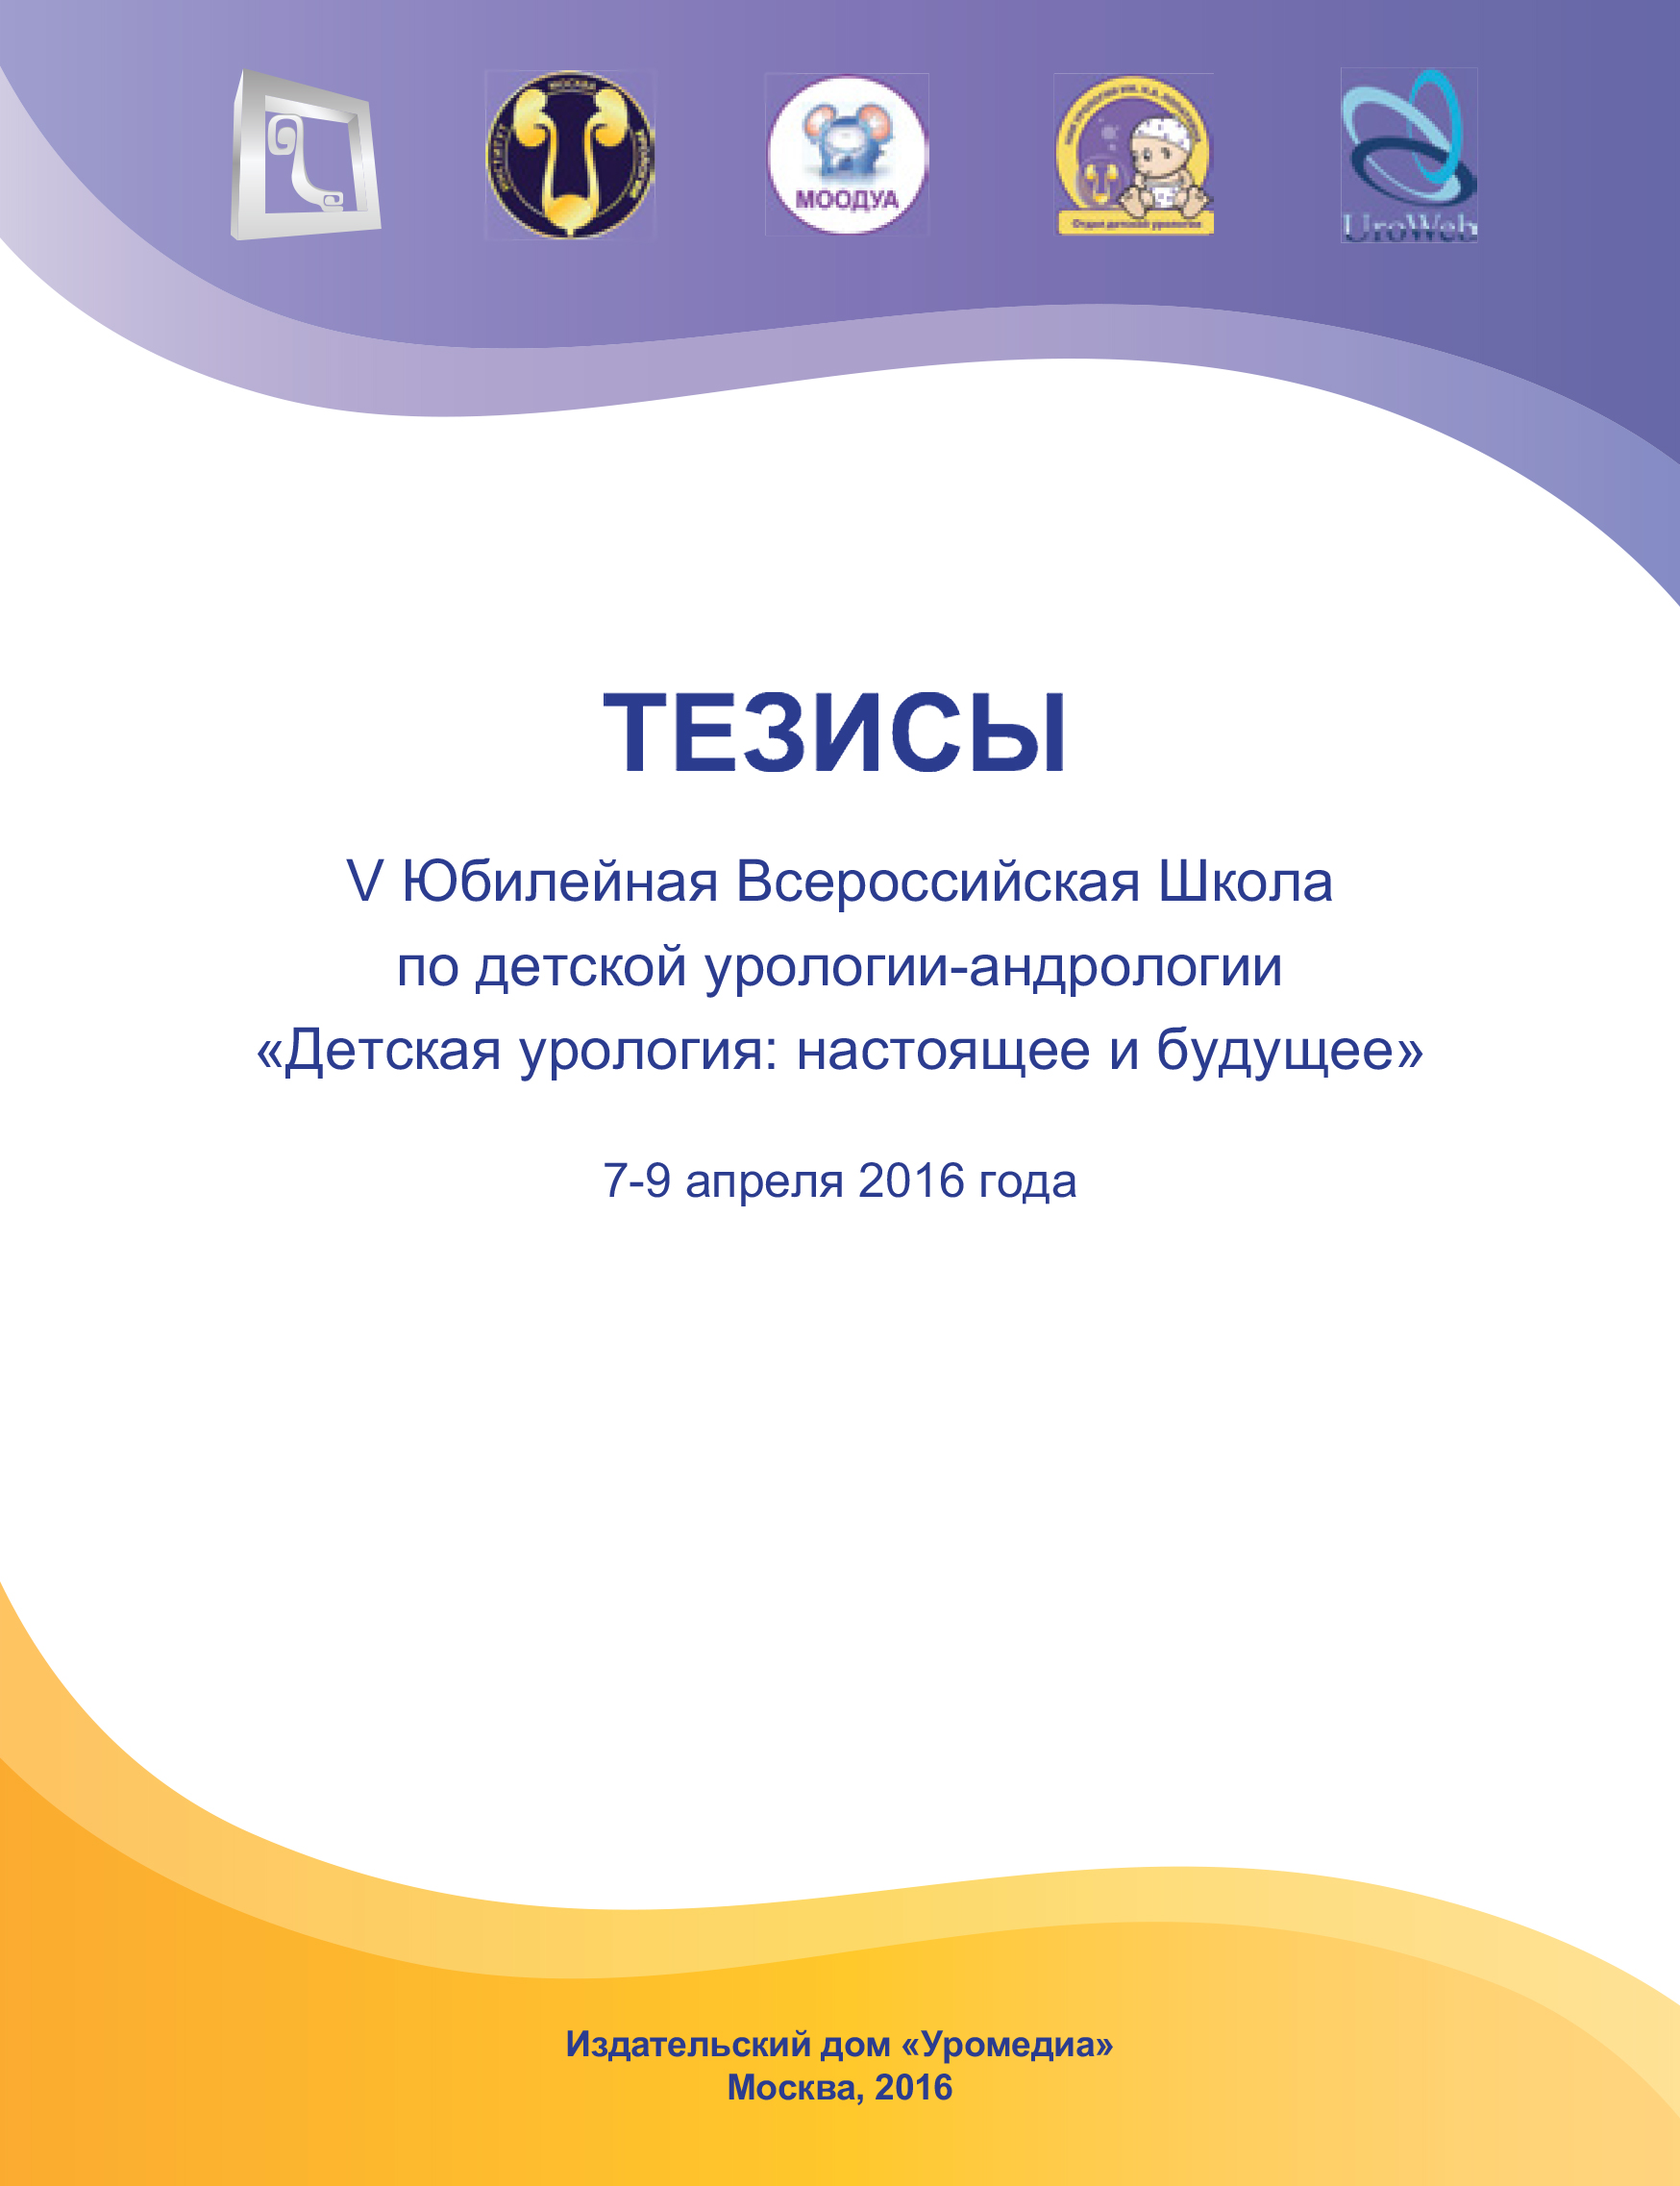 Литотомия